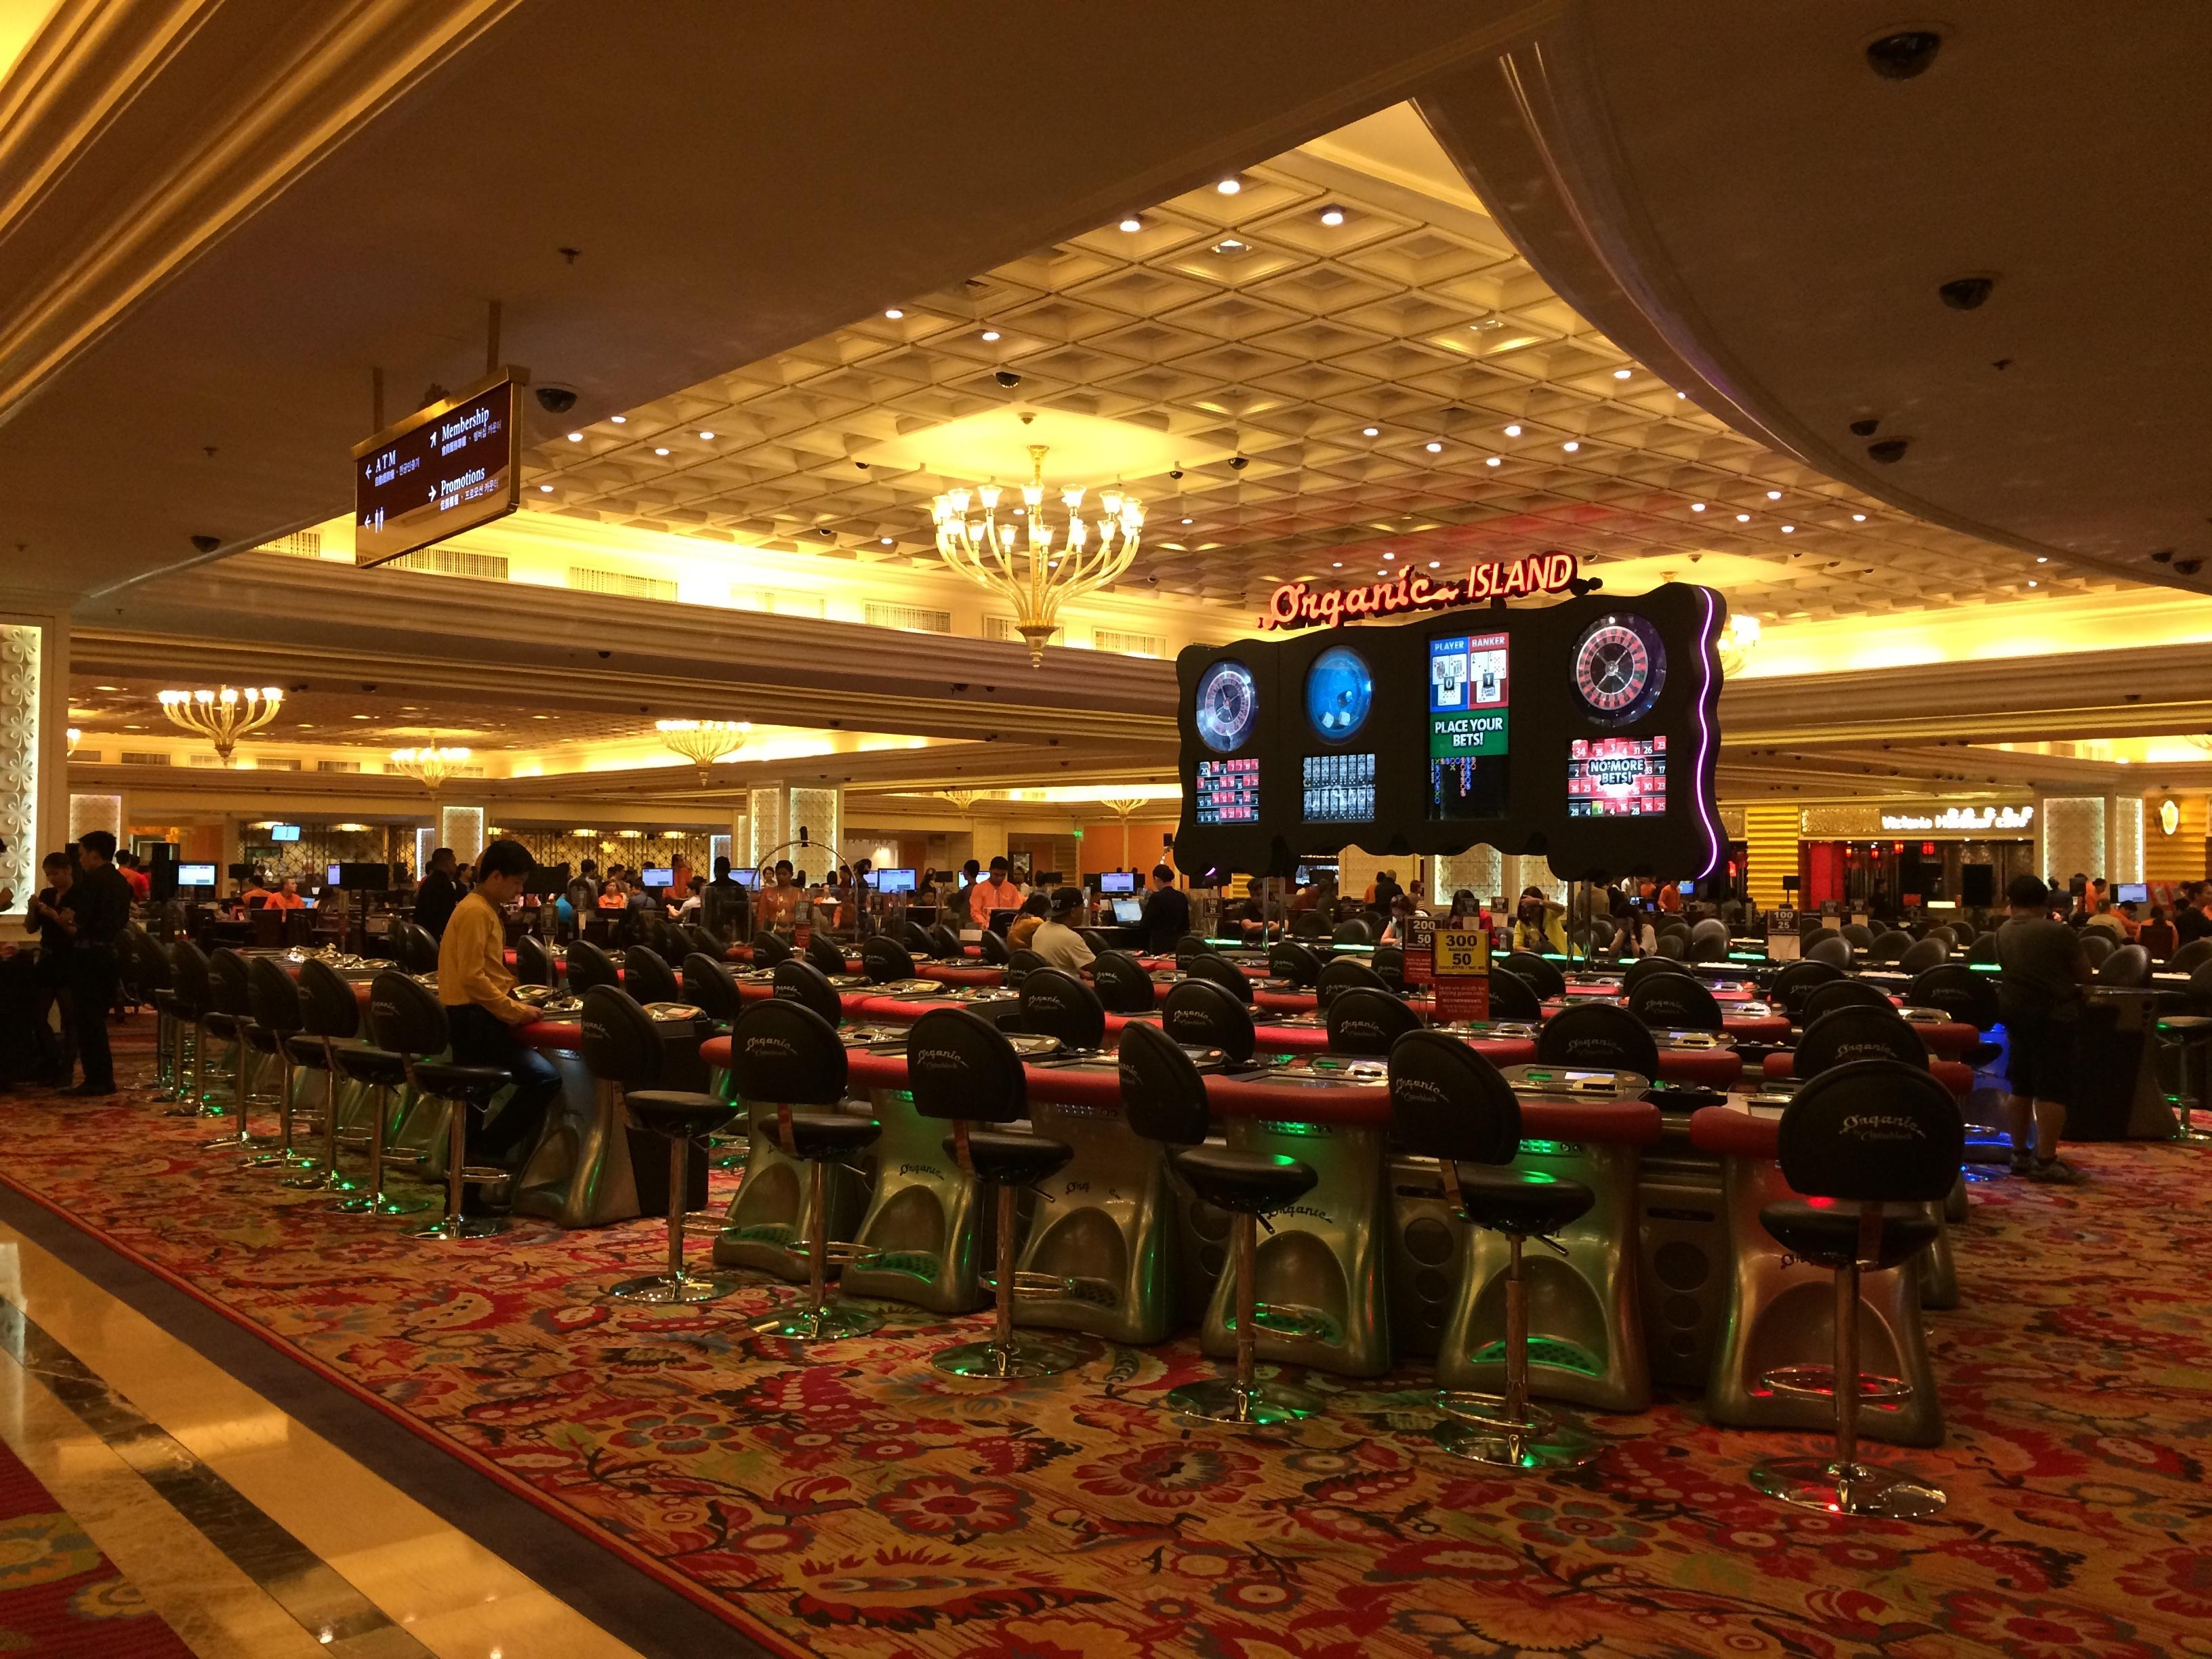 The Star Casino Food Court